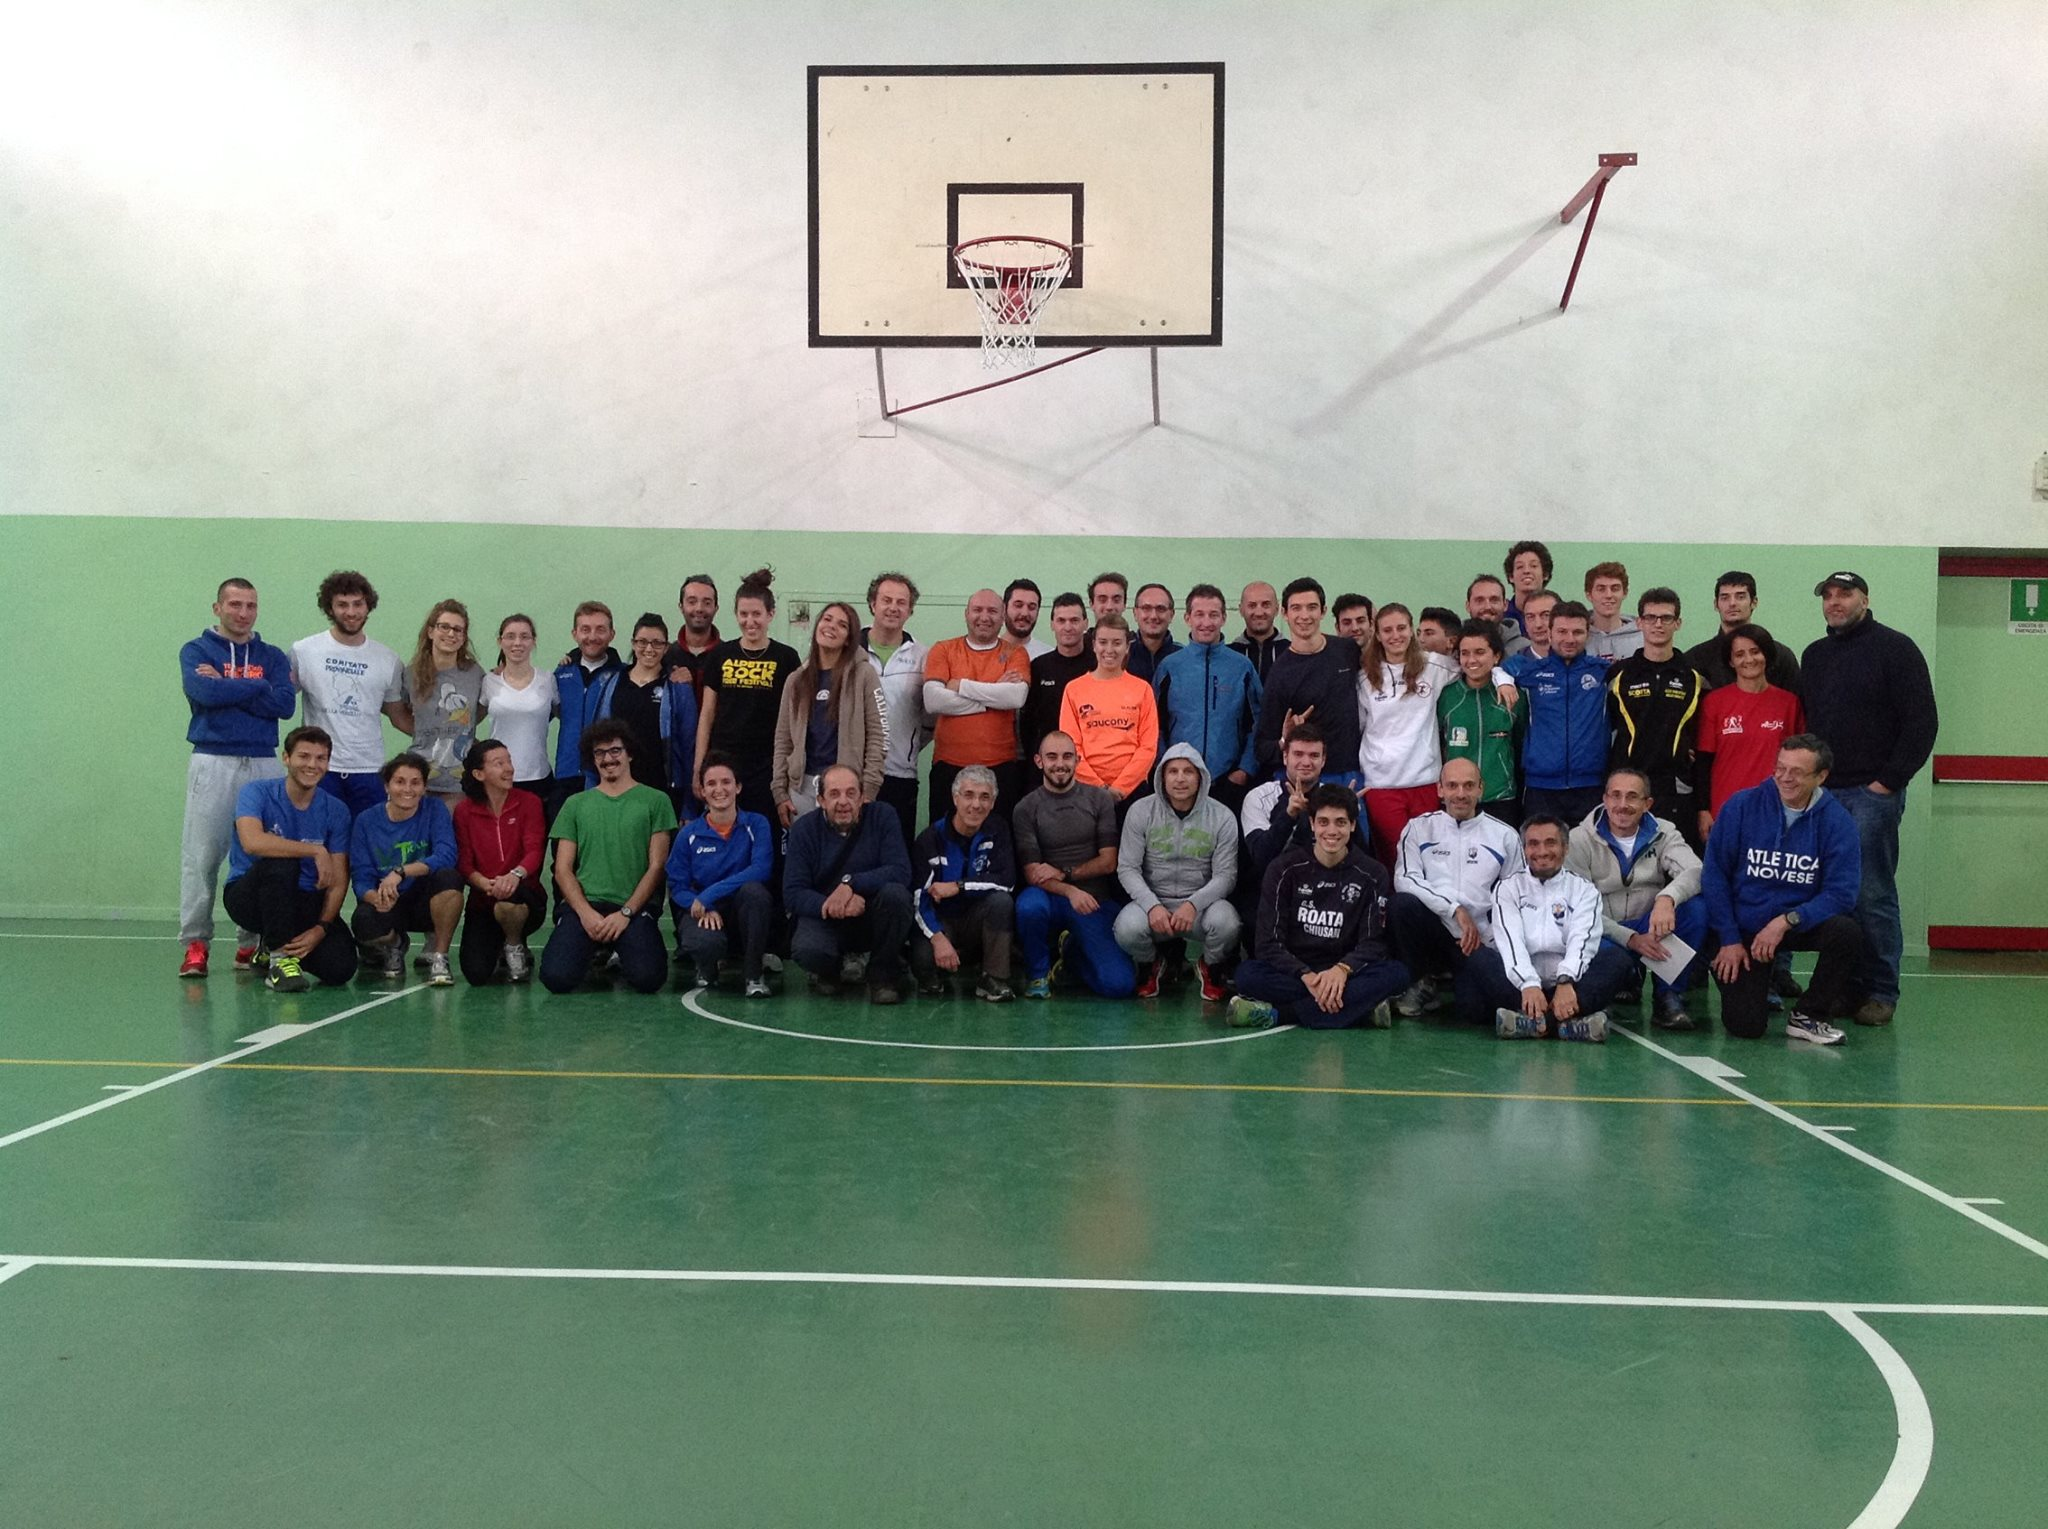 2014.11.22-23 Mondovi' Corso tecnici